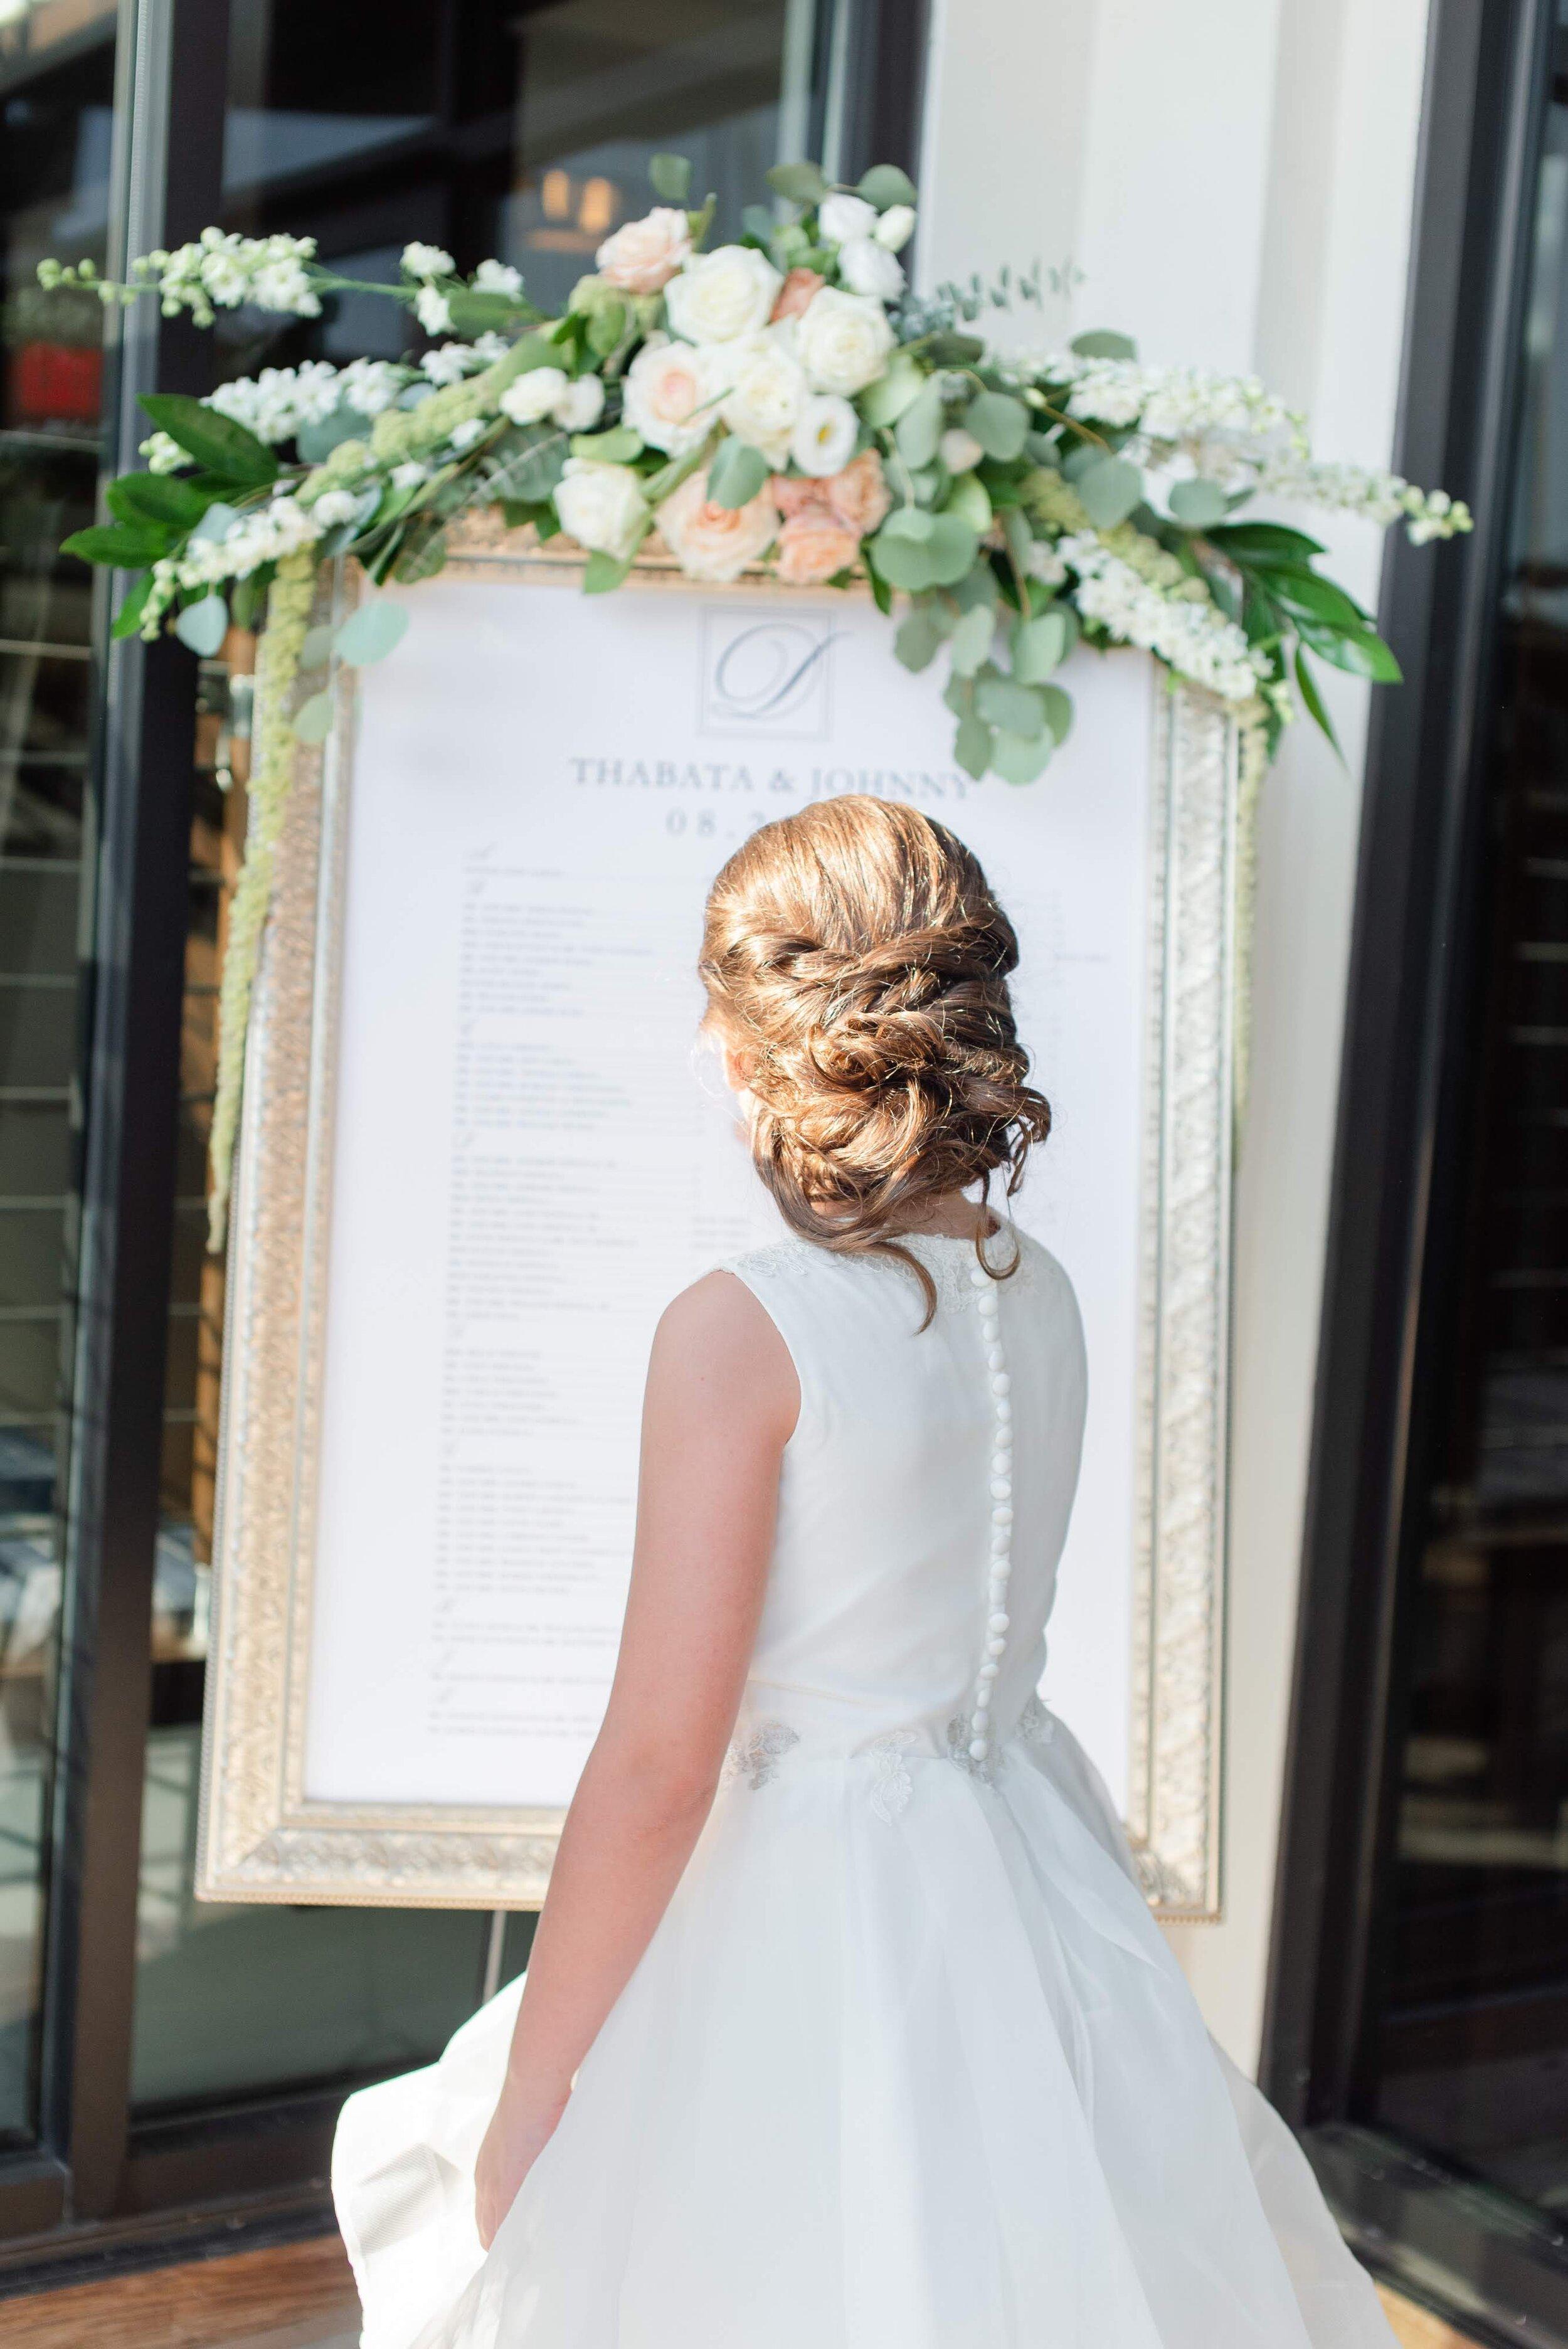 Annapolis Yacht Club Wedding Thabata & Johhny Megan Kelsey Photography-639 (1).jpg